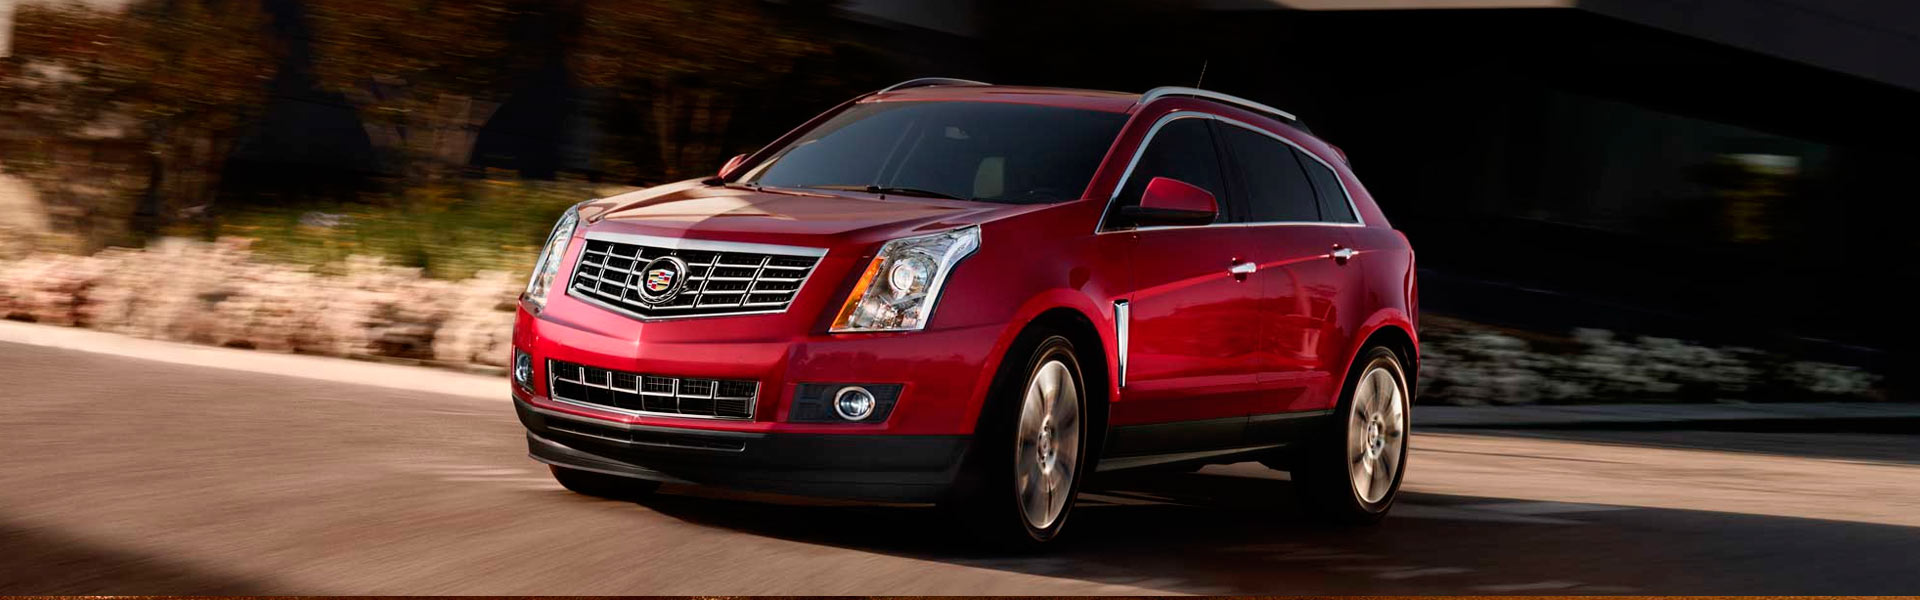 Замена наконечника рулевой тяги Cadillac